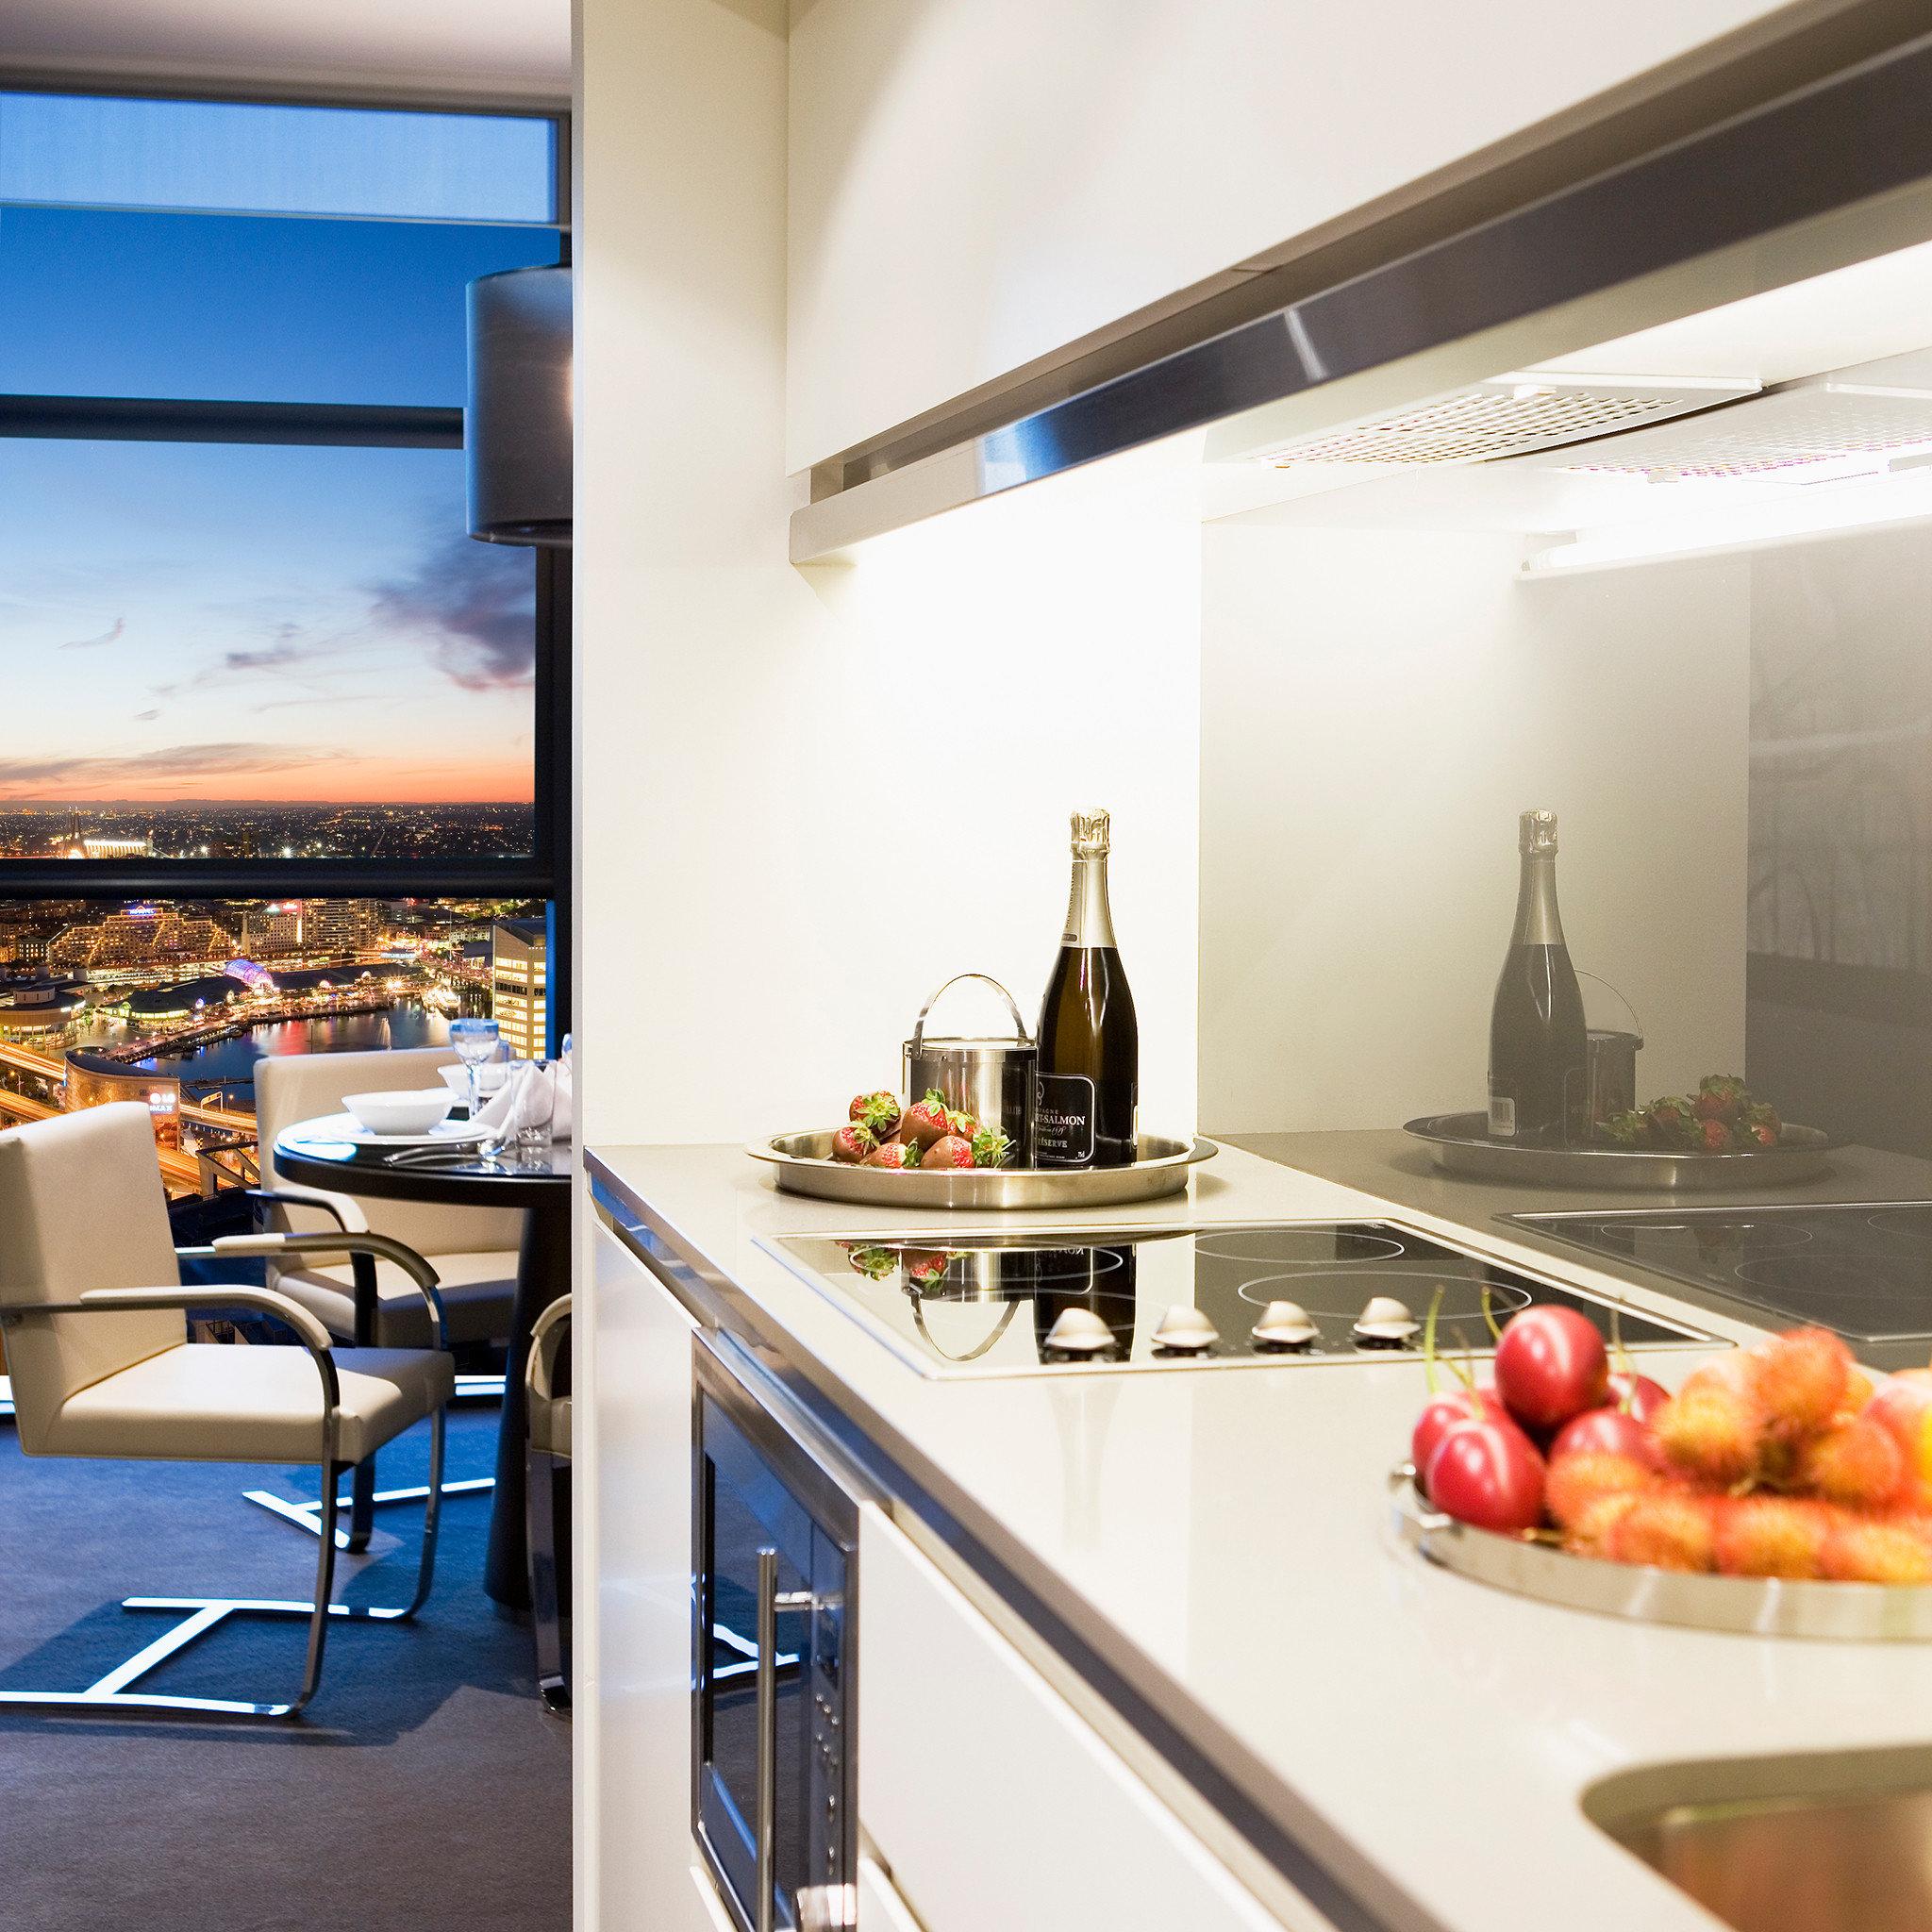 City Drink Eat Kitchen Scenic views property restaurant home lighting living room condominium loft cuisine